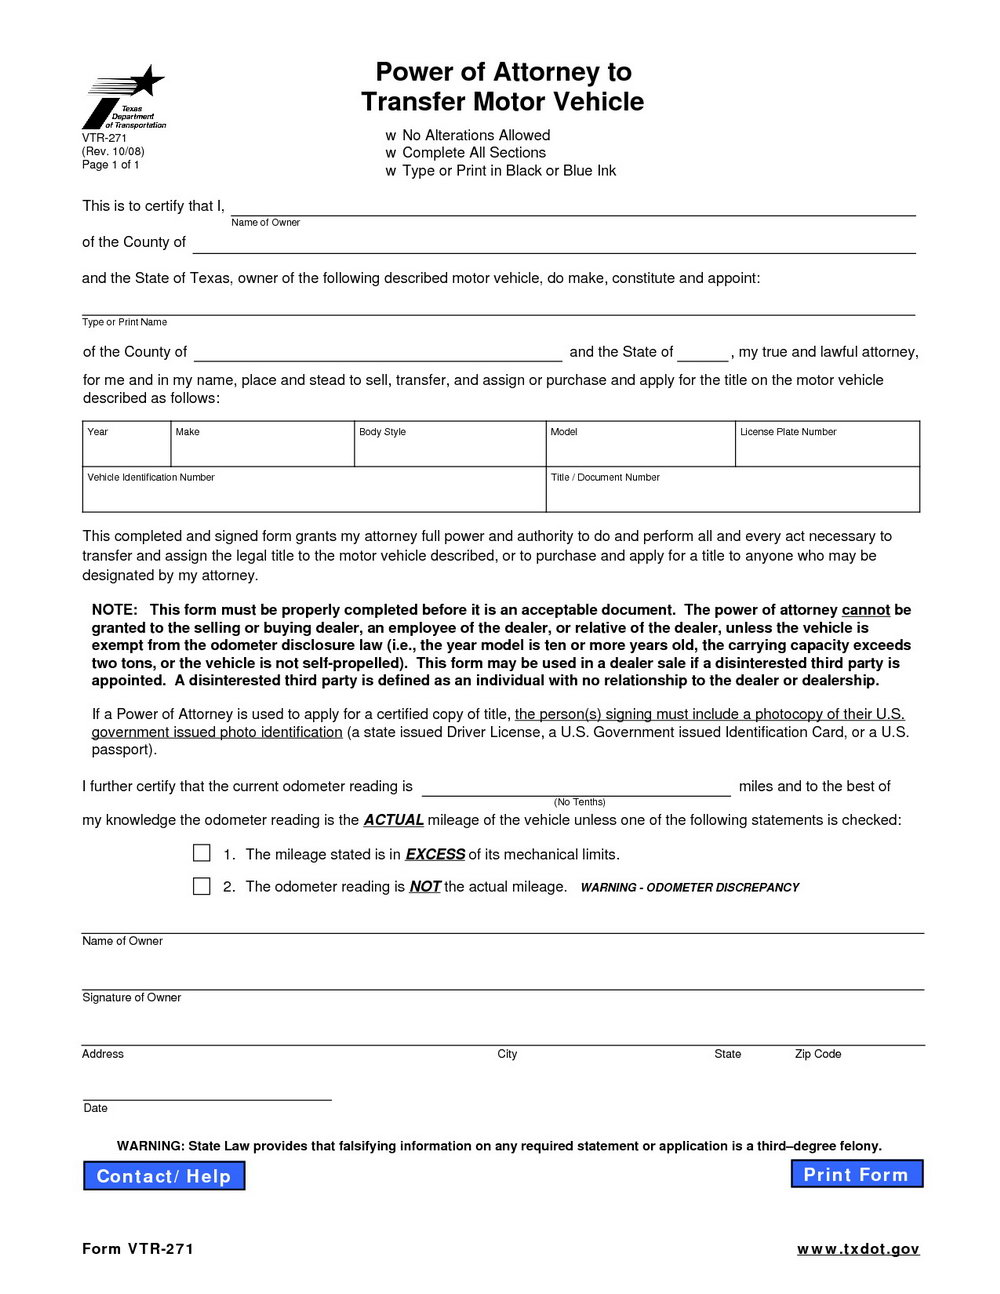 Power Of Attorney Form Nevada Dmv